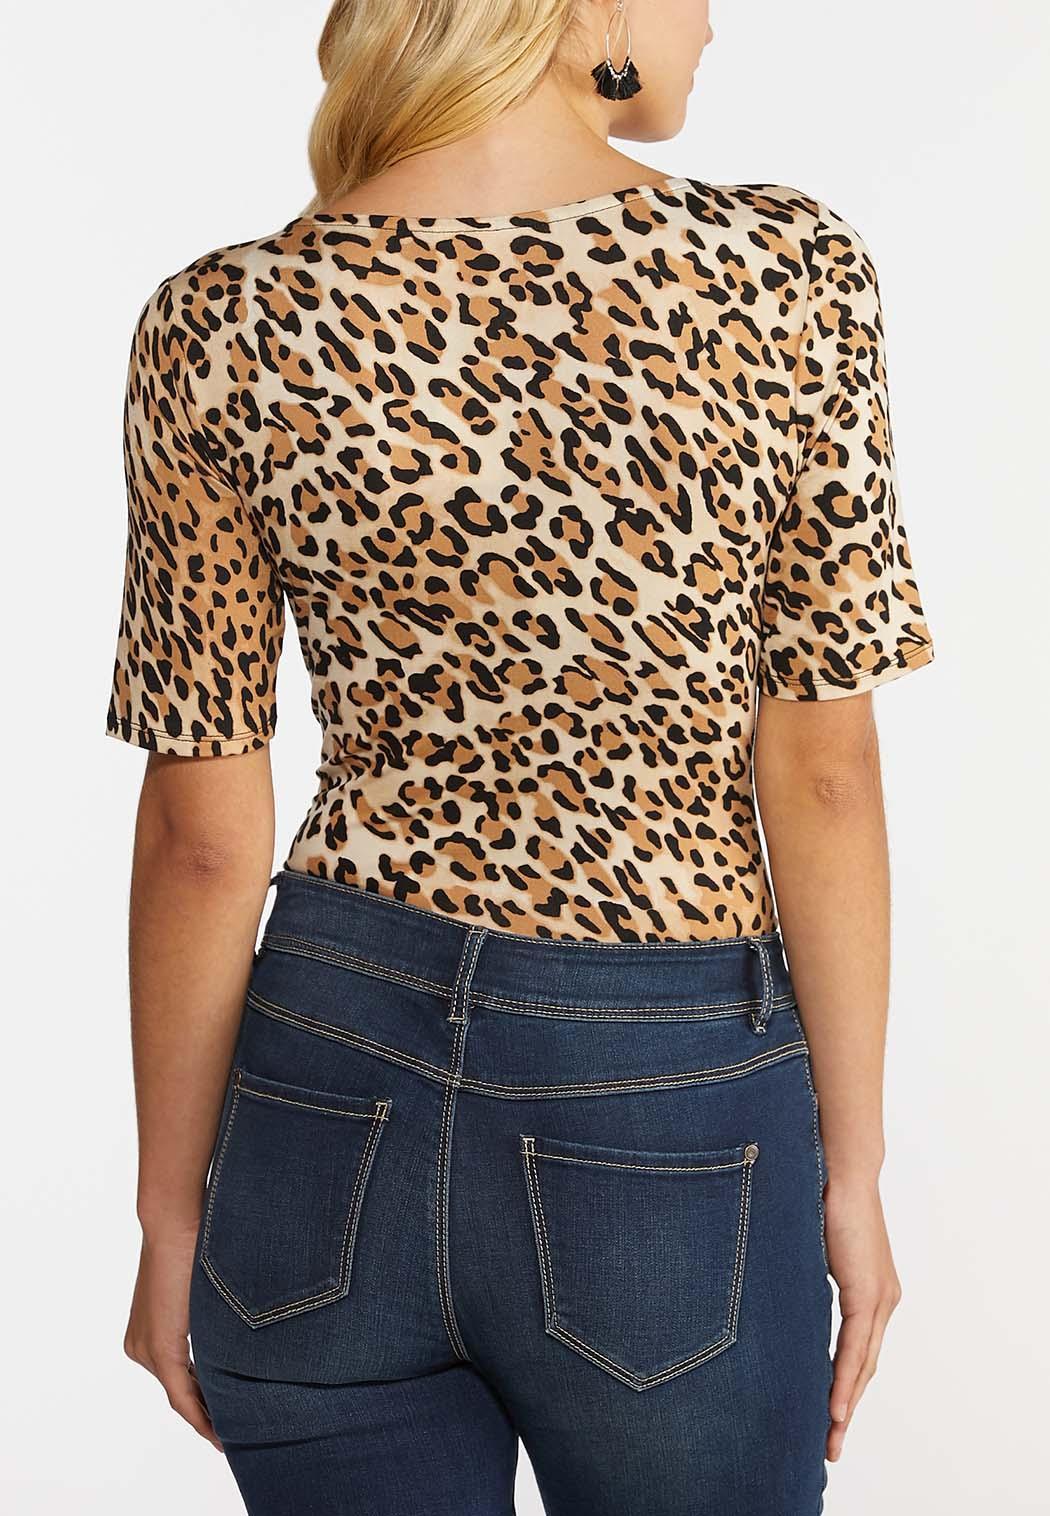 Leopard Print Bodysuit (Item #44356823)